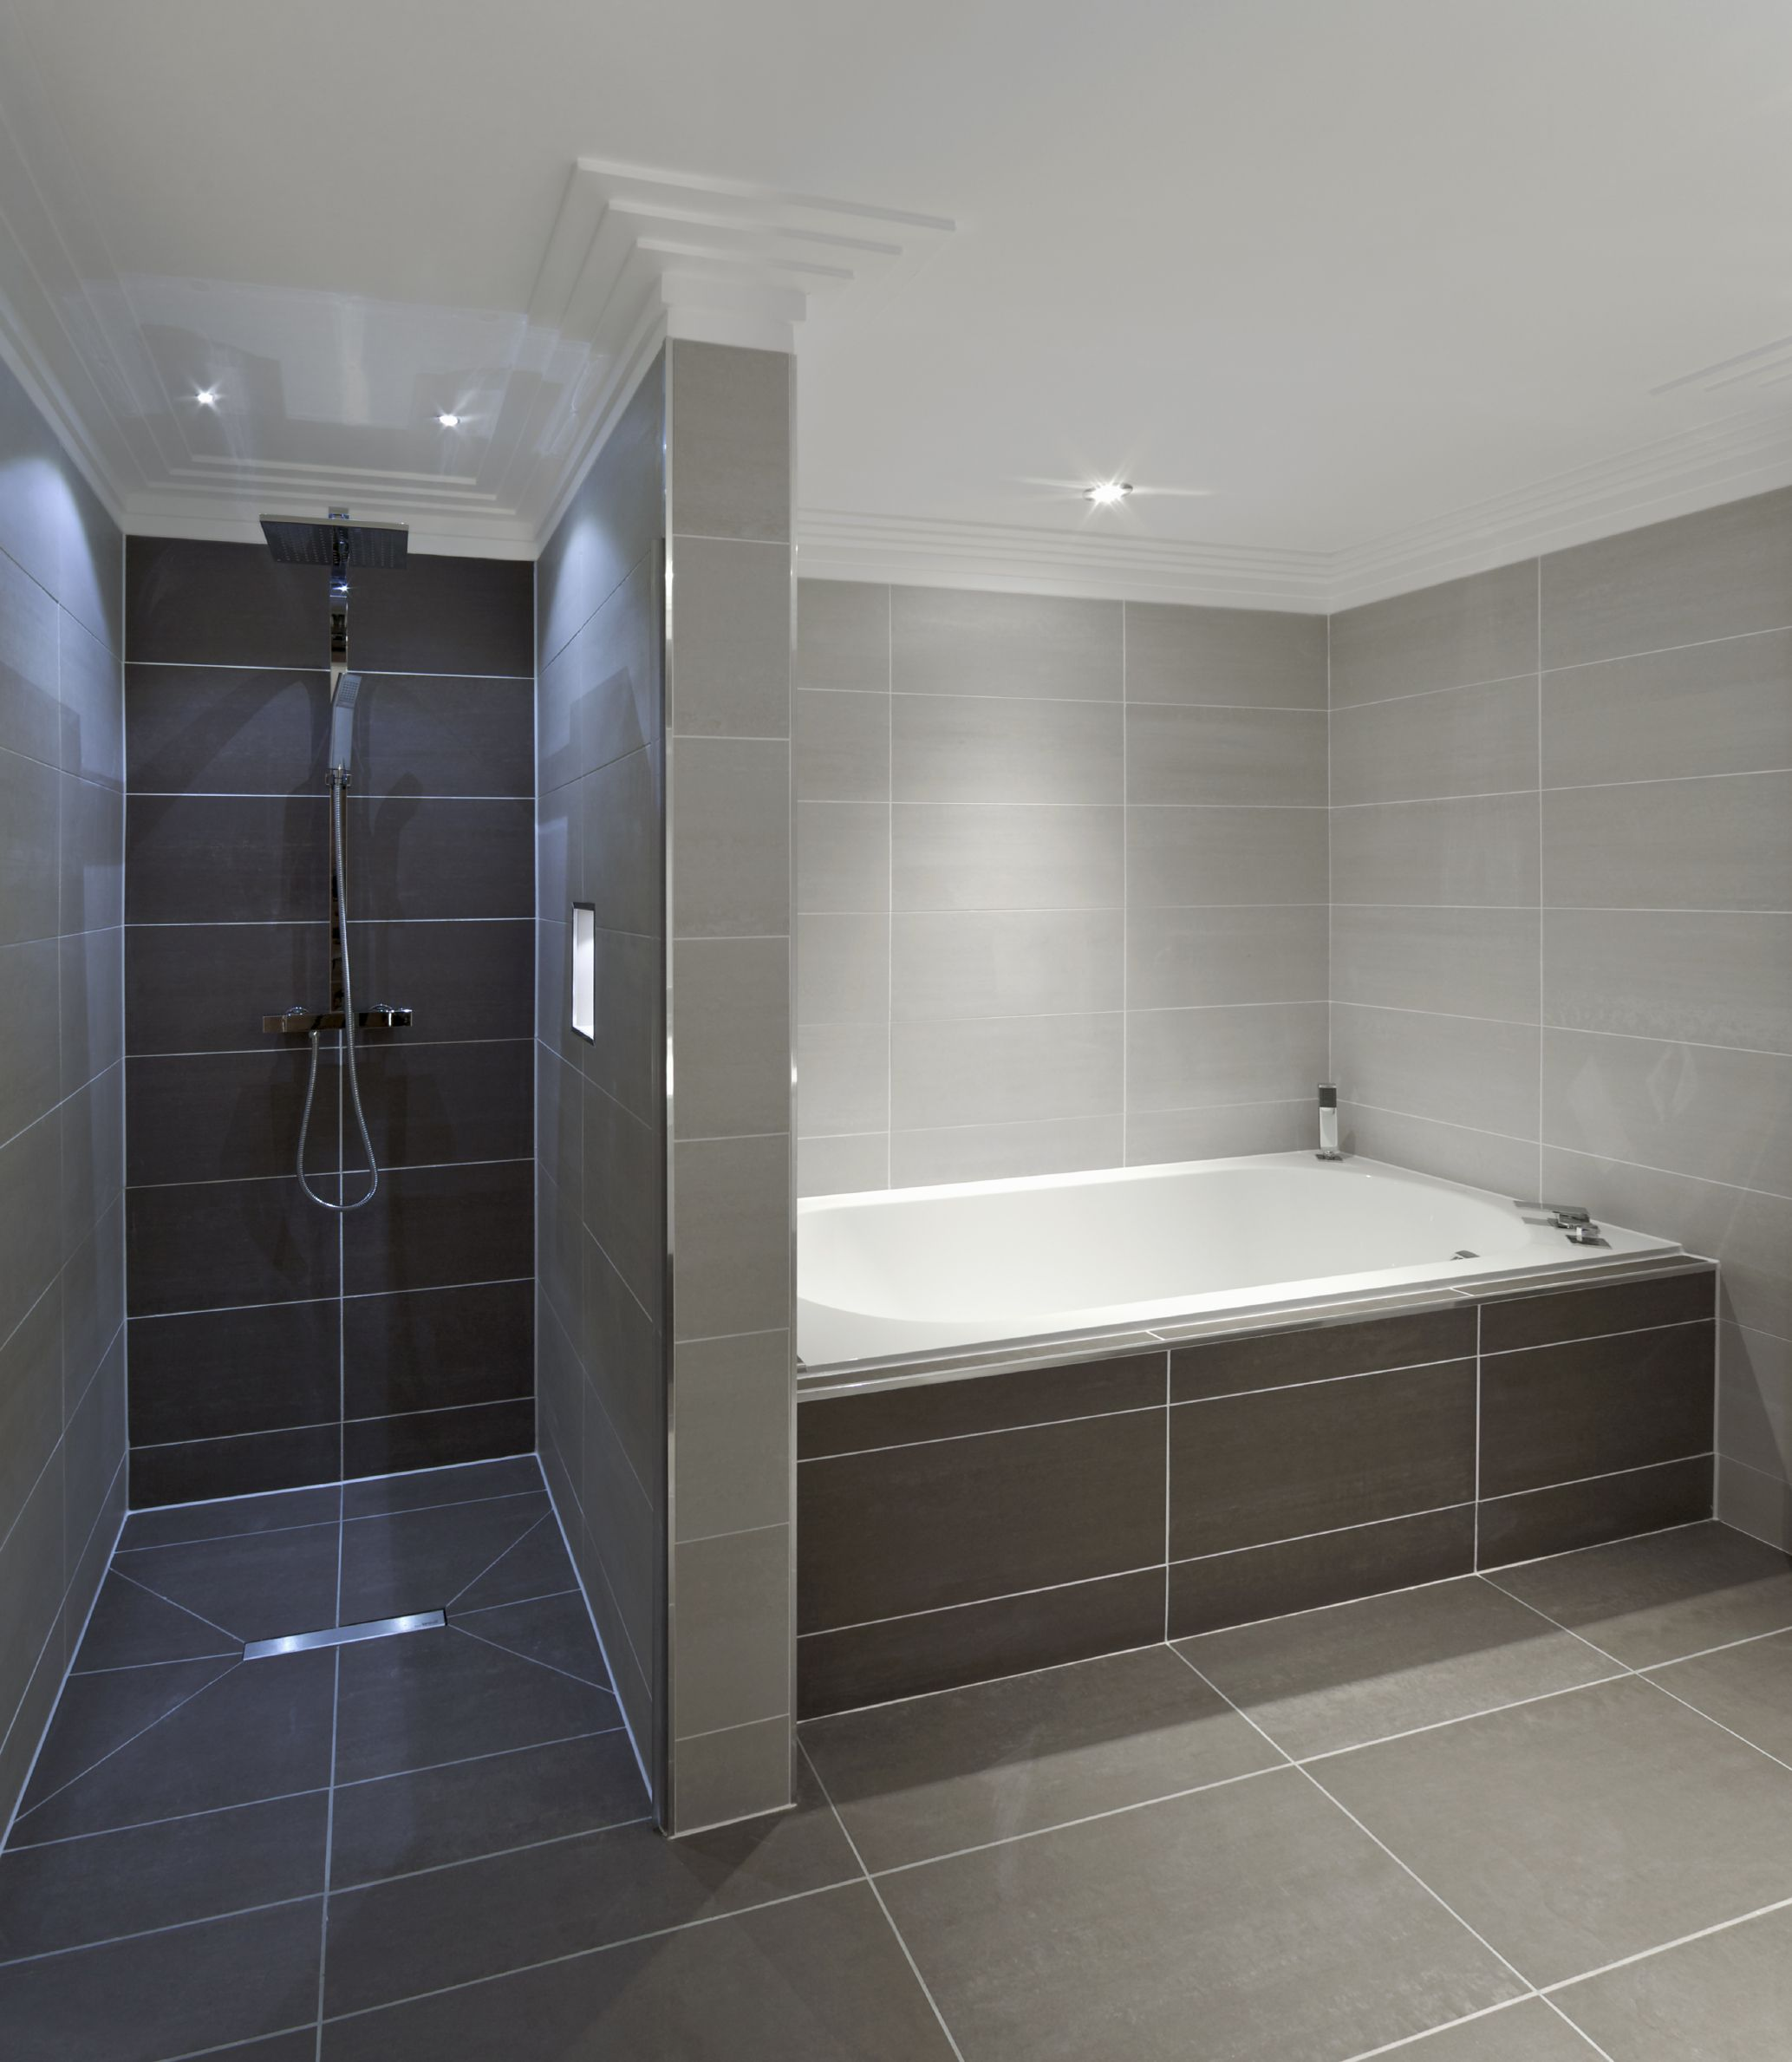 Soft Lighting And Dramatic Tile Blend Perfectly Http Www Devinebath Com Bathroom Best Bathtubs Bathtub Tile Bathroom Layout